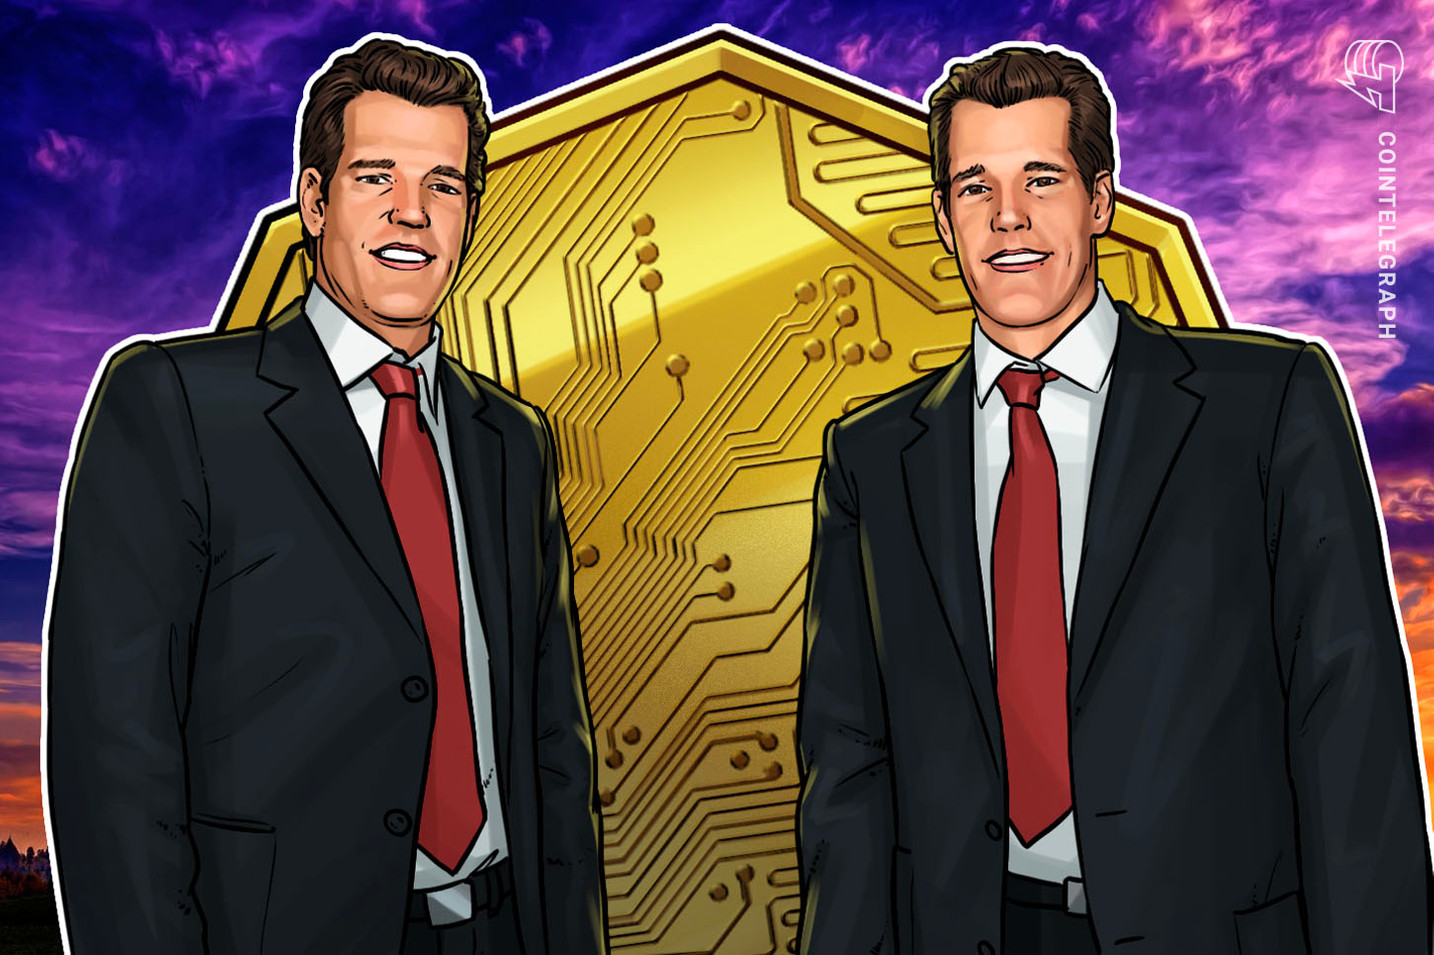 Crypto Exchange Gemini Joins British Telecom's Radianz Cloud Broker Community